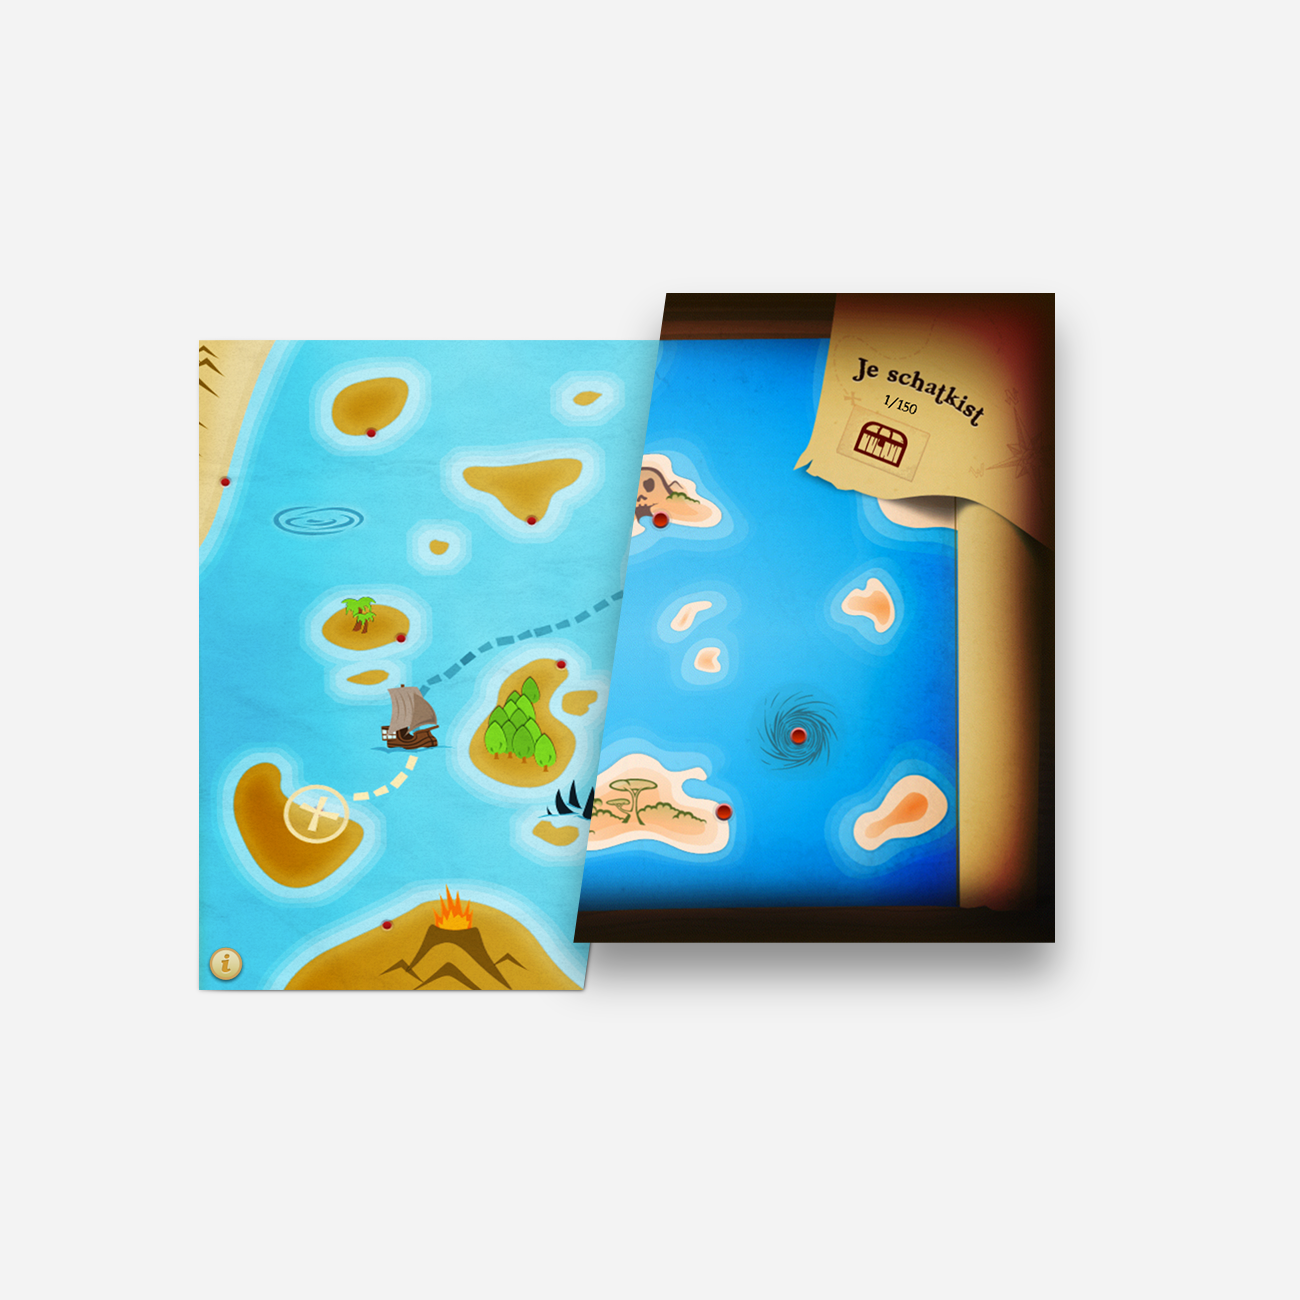 Piet Piraat Schattenjacht IOS Concept Final